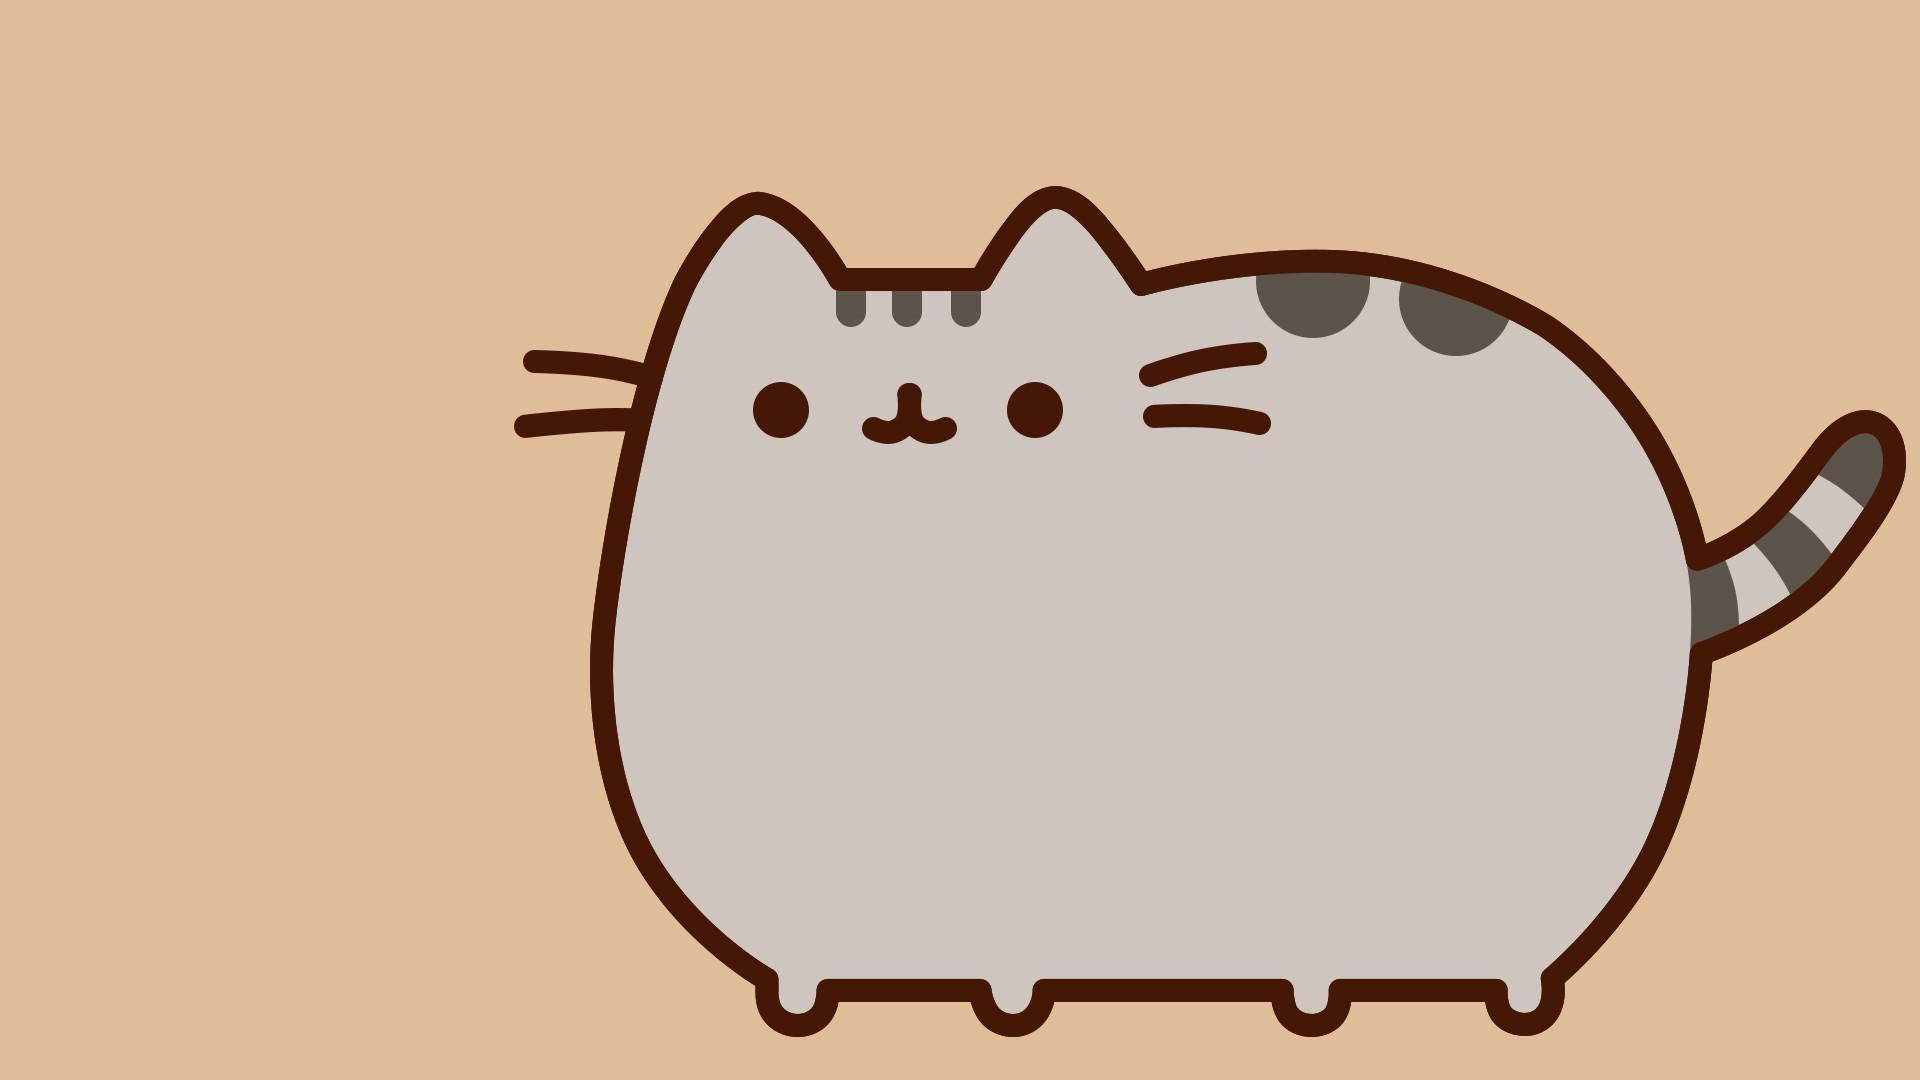 Pusheen cat wallpaper | Pusheen | Pinterest | S5 wallpaper, Taps .